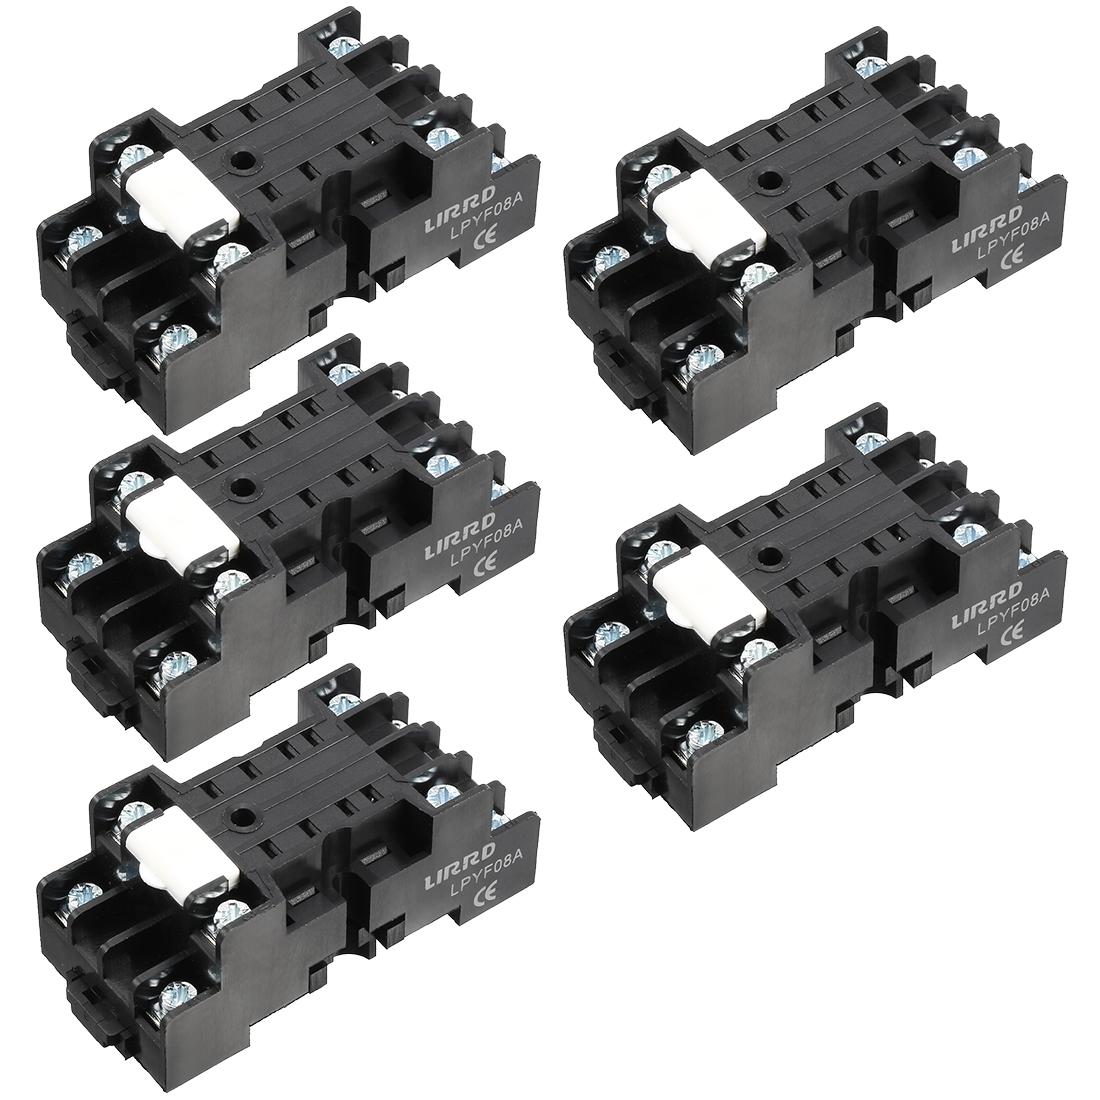 5Pcs 5A 8P DIN Rail Mount Power Relay Socket Base Holder